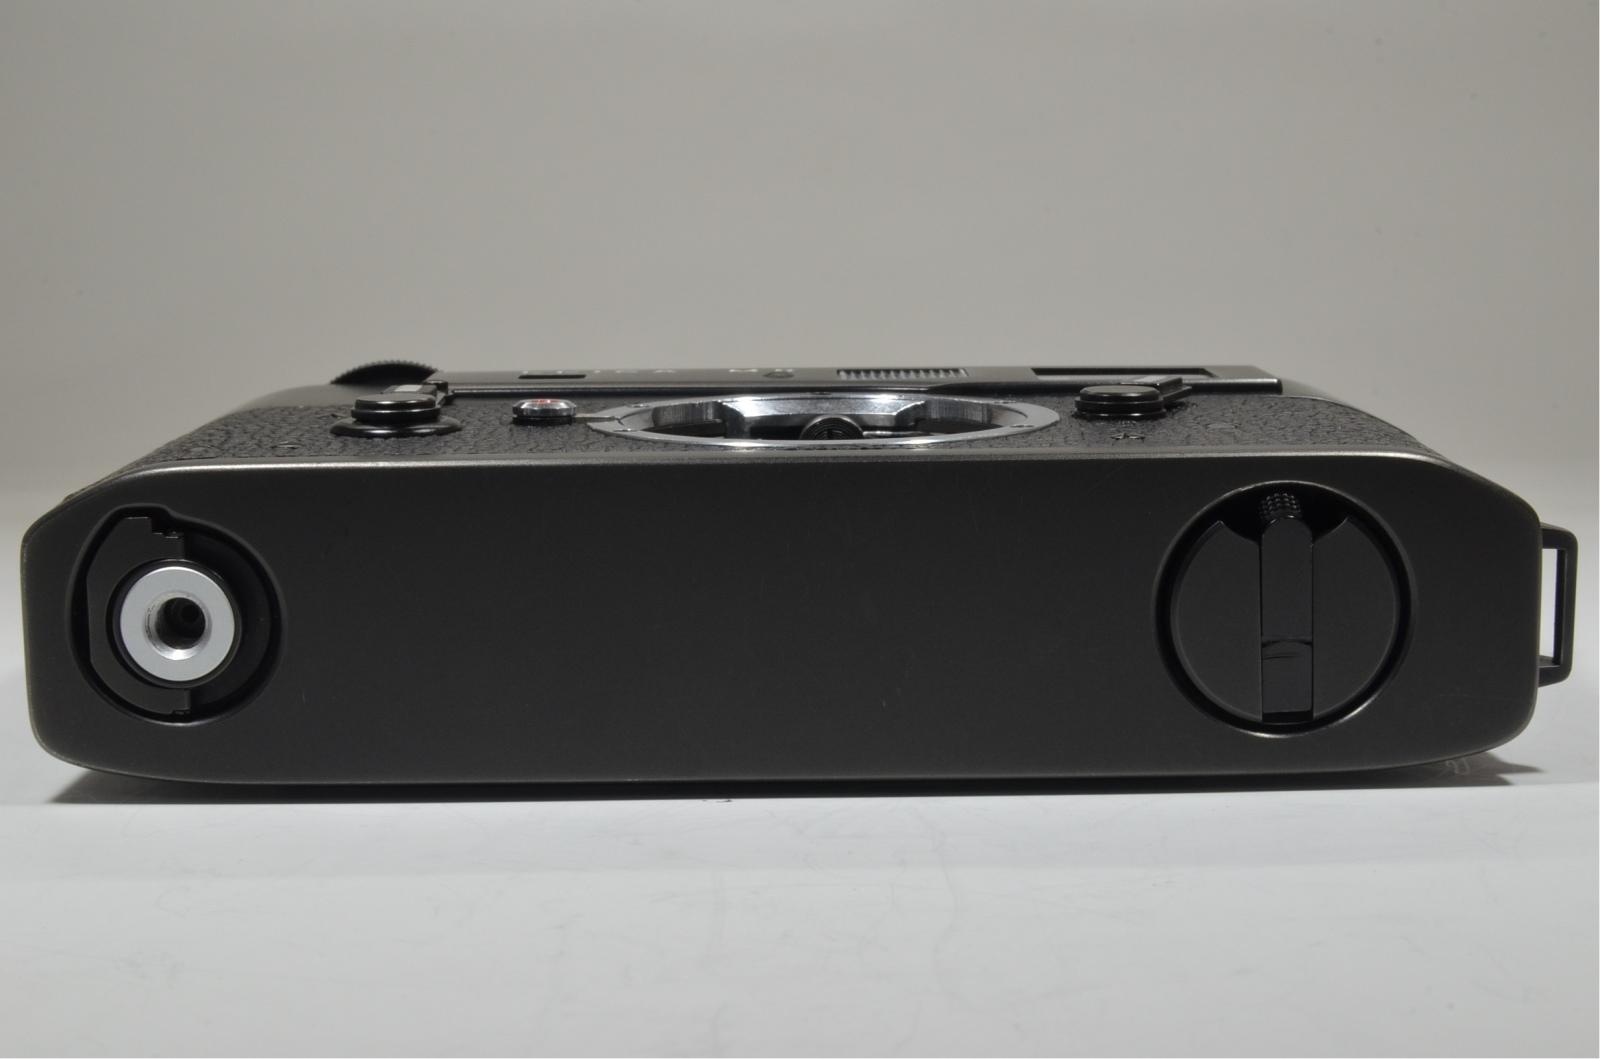 leica m5 black 3 lug serial no.1377108 year 1973 with l seal